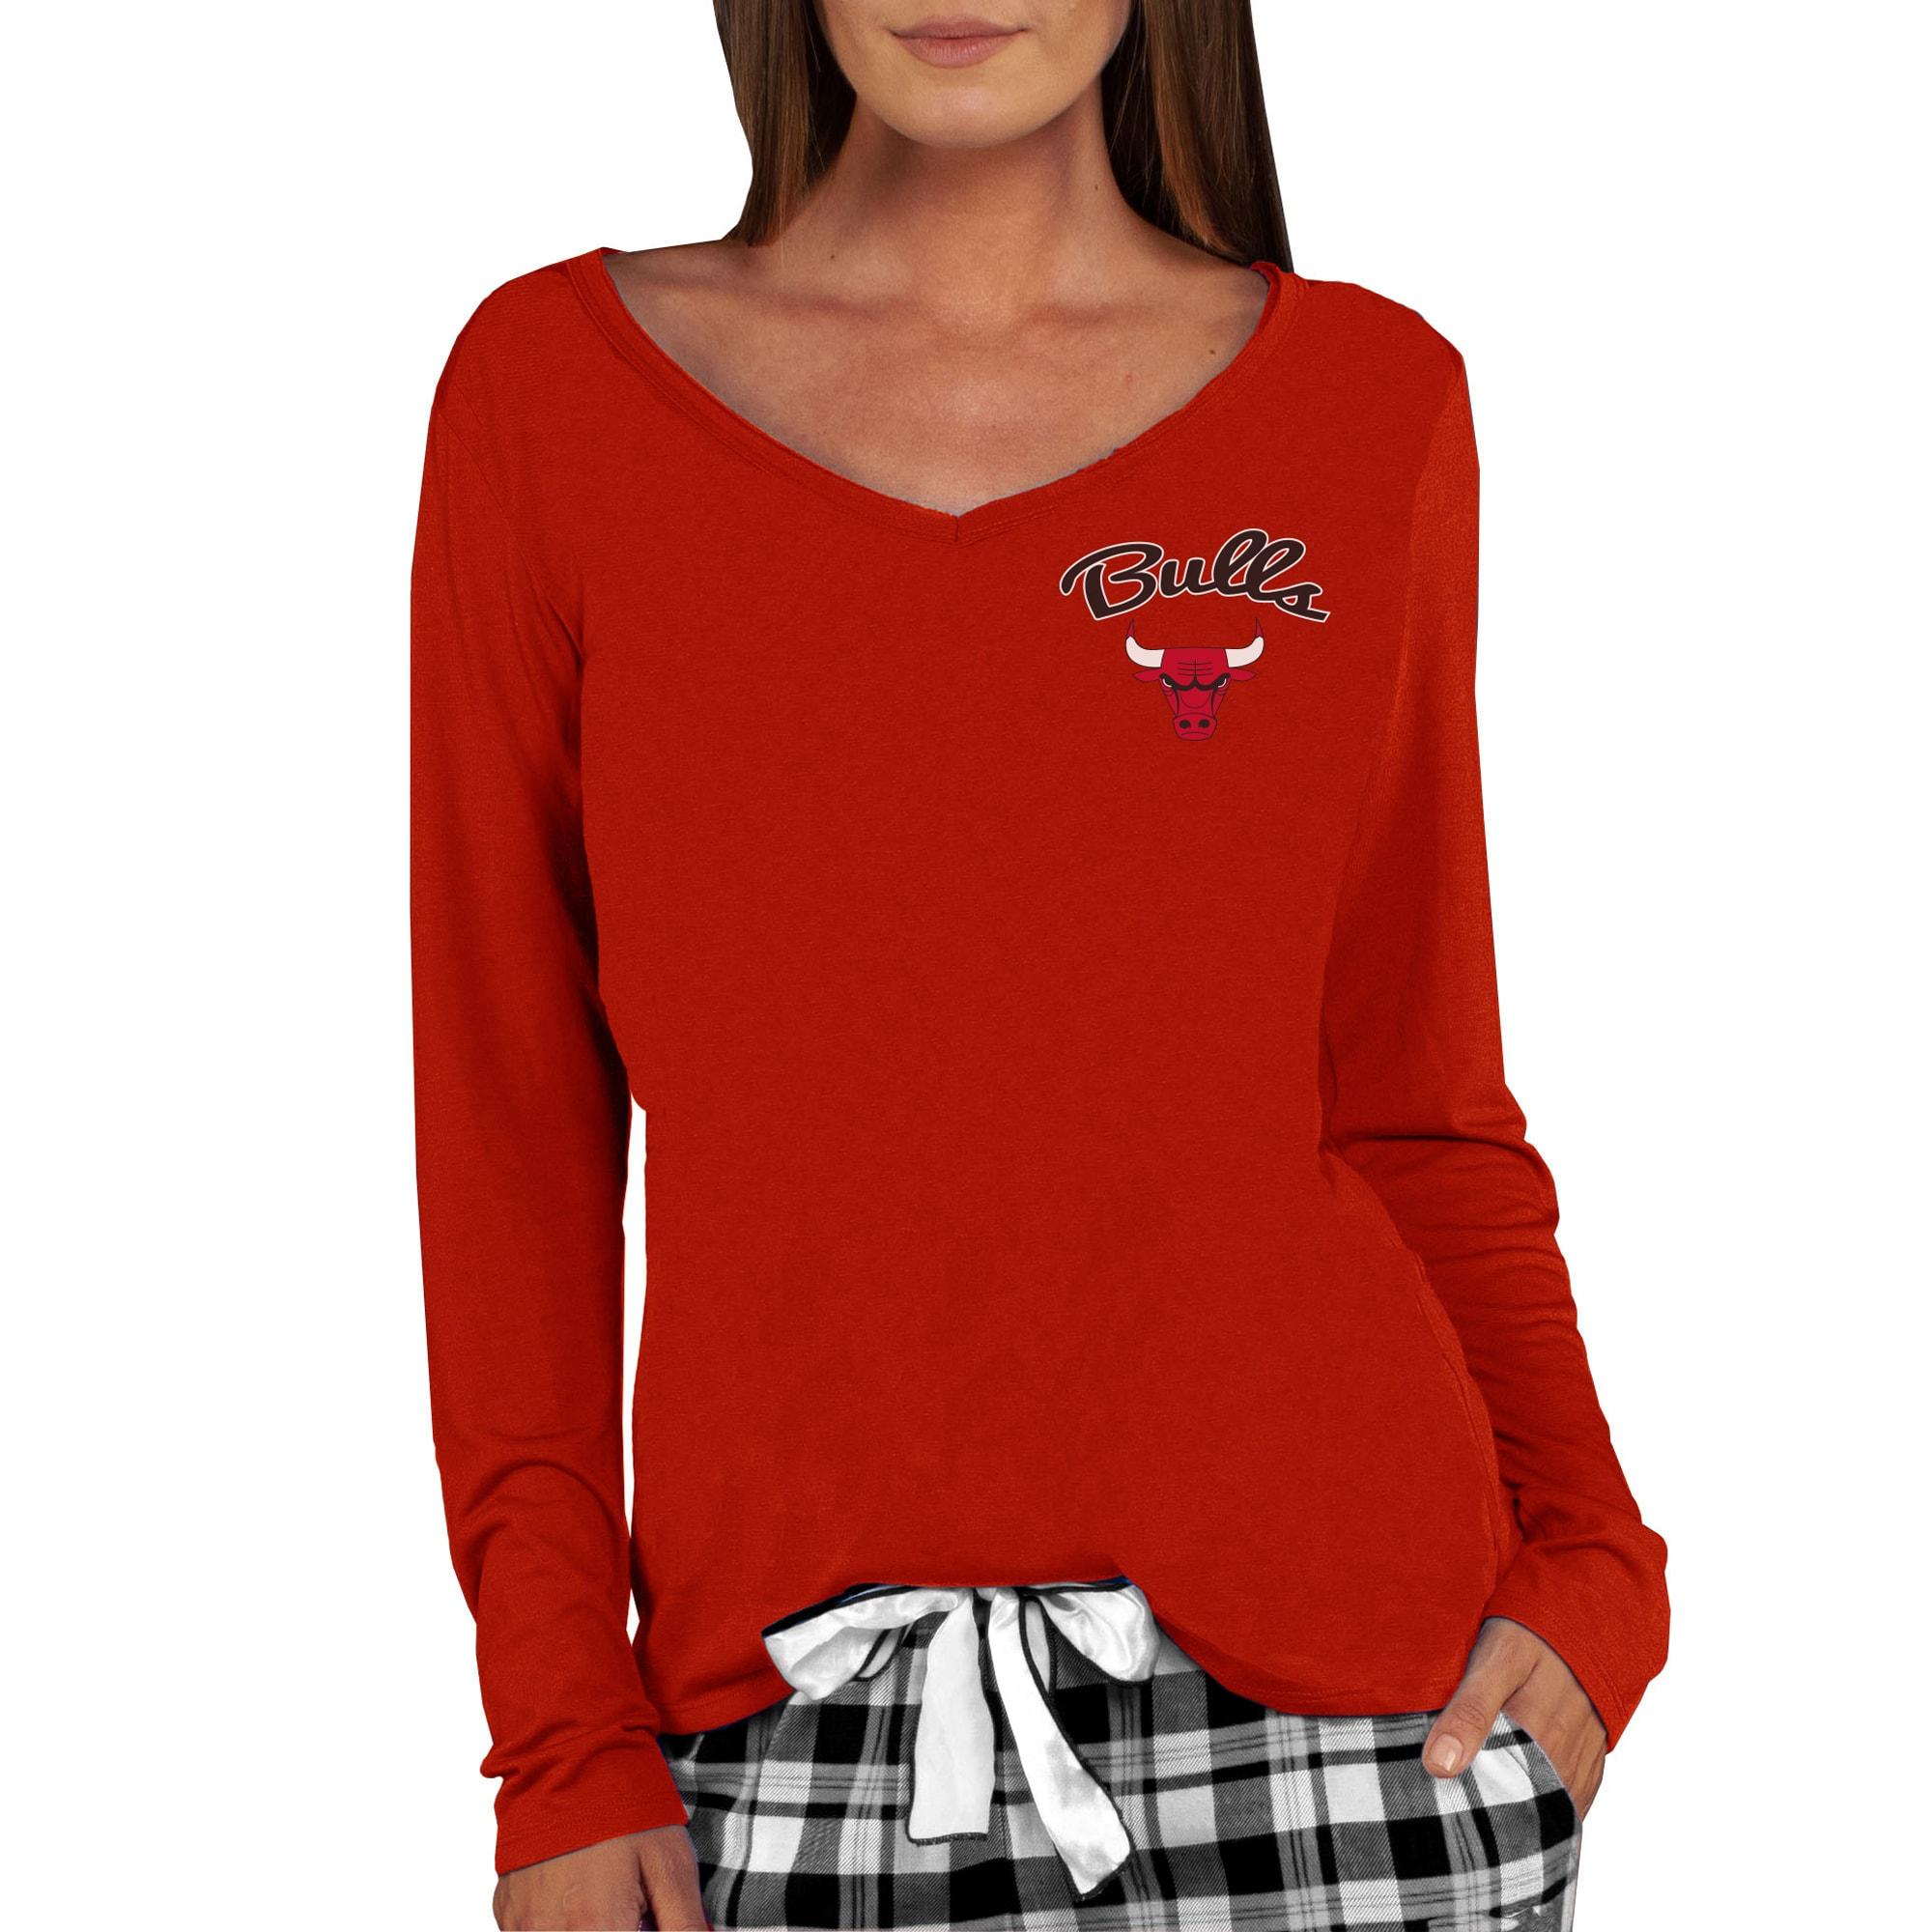 Chicago Bulls Concepts Sport Women's Marathon V-Neck Long Sleeve T-Shirt - Red